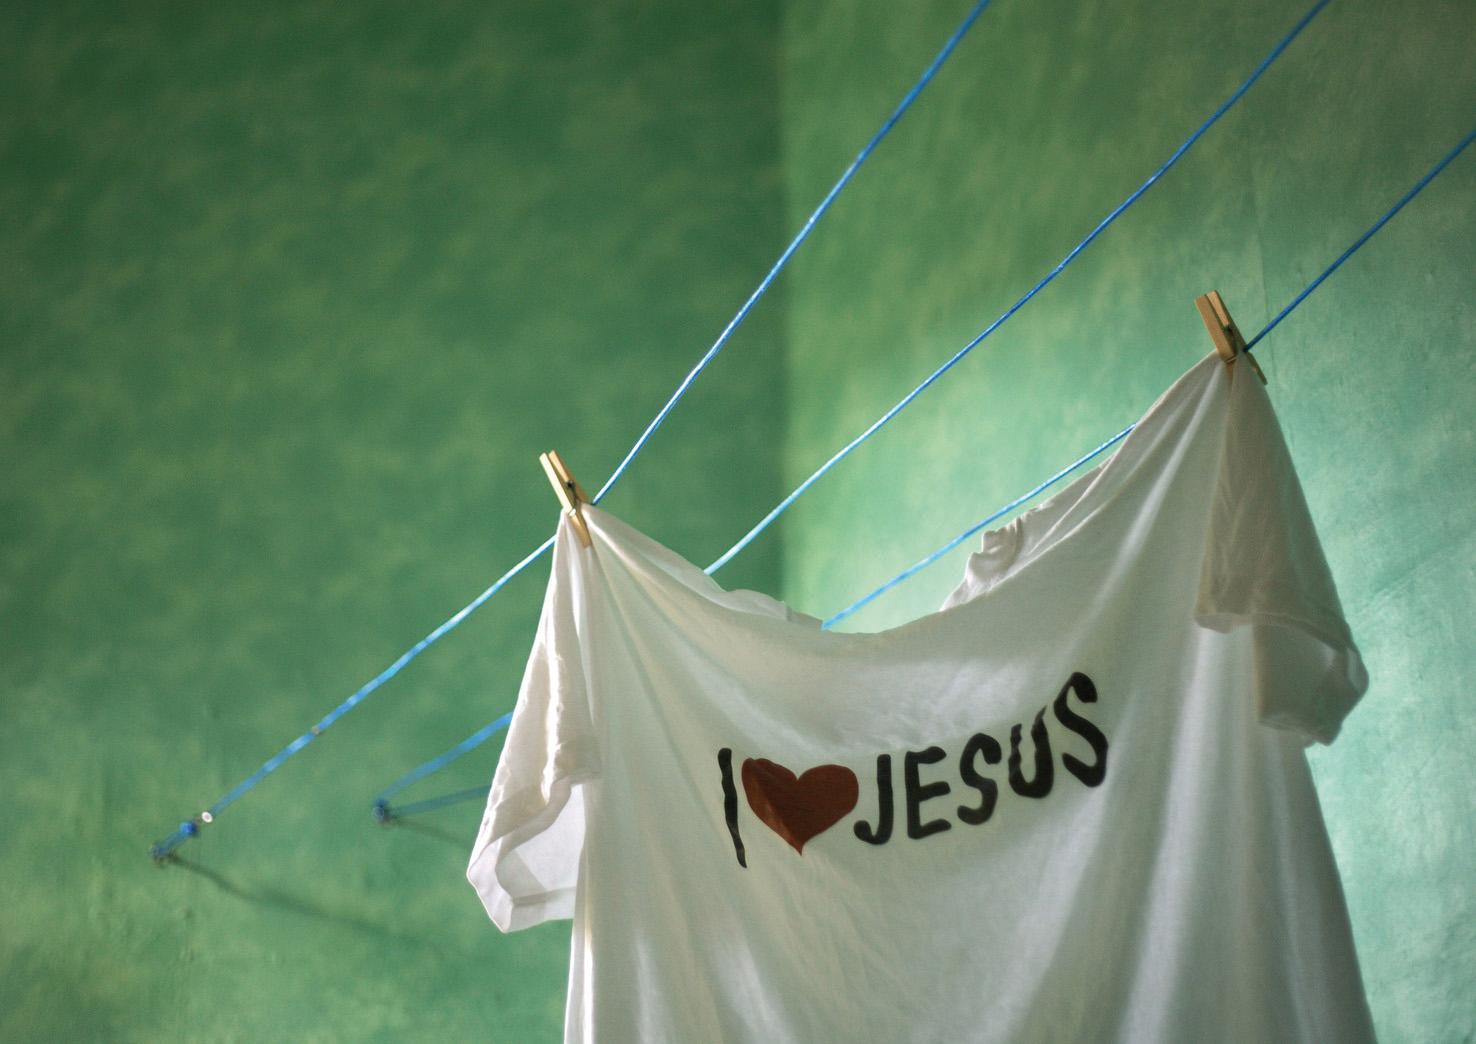 Christus T-Shirt 093_4705_RGB